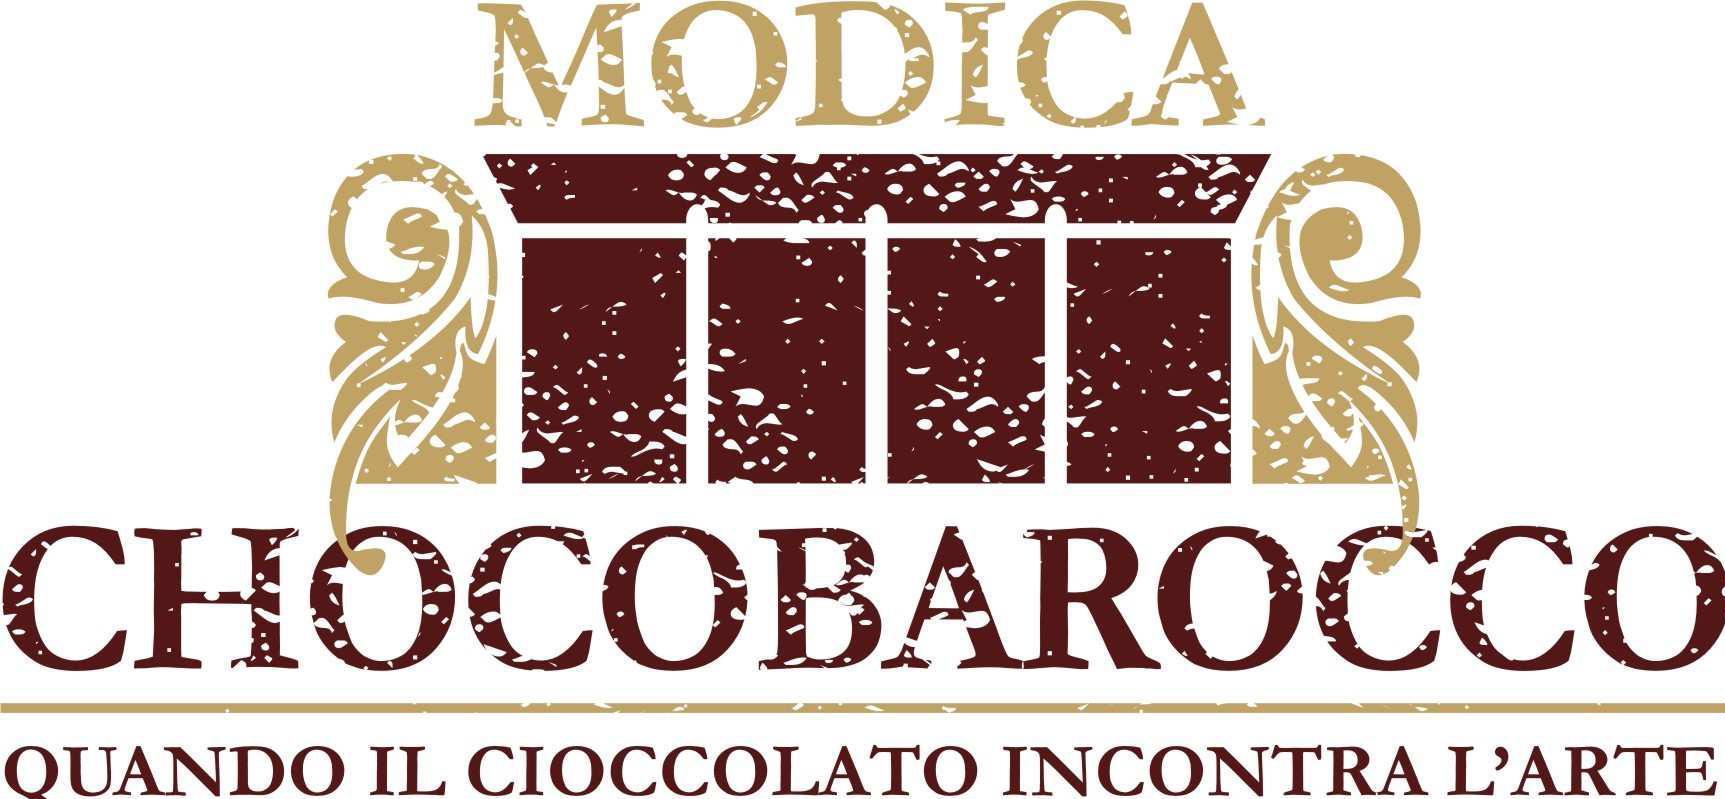 chocobarocco a modica, da http://argasicilia.altervista.org/blog/?p=395